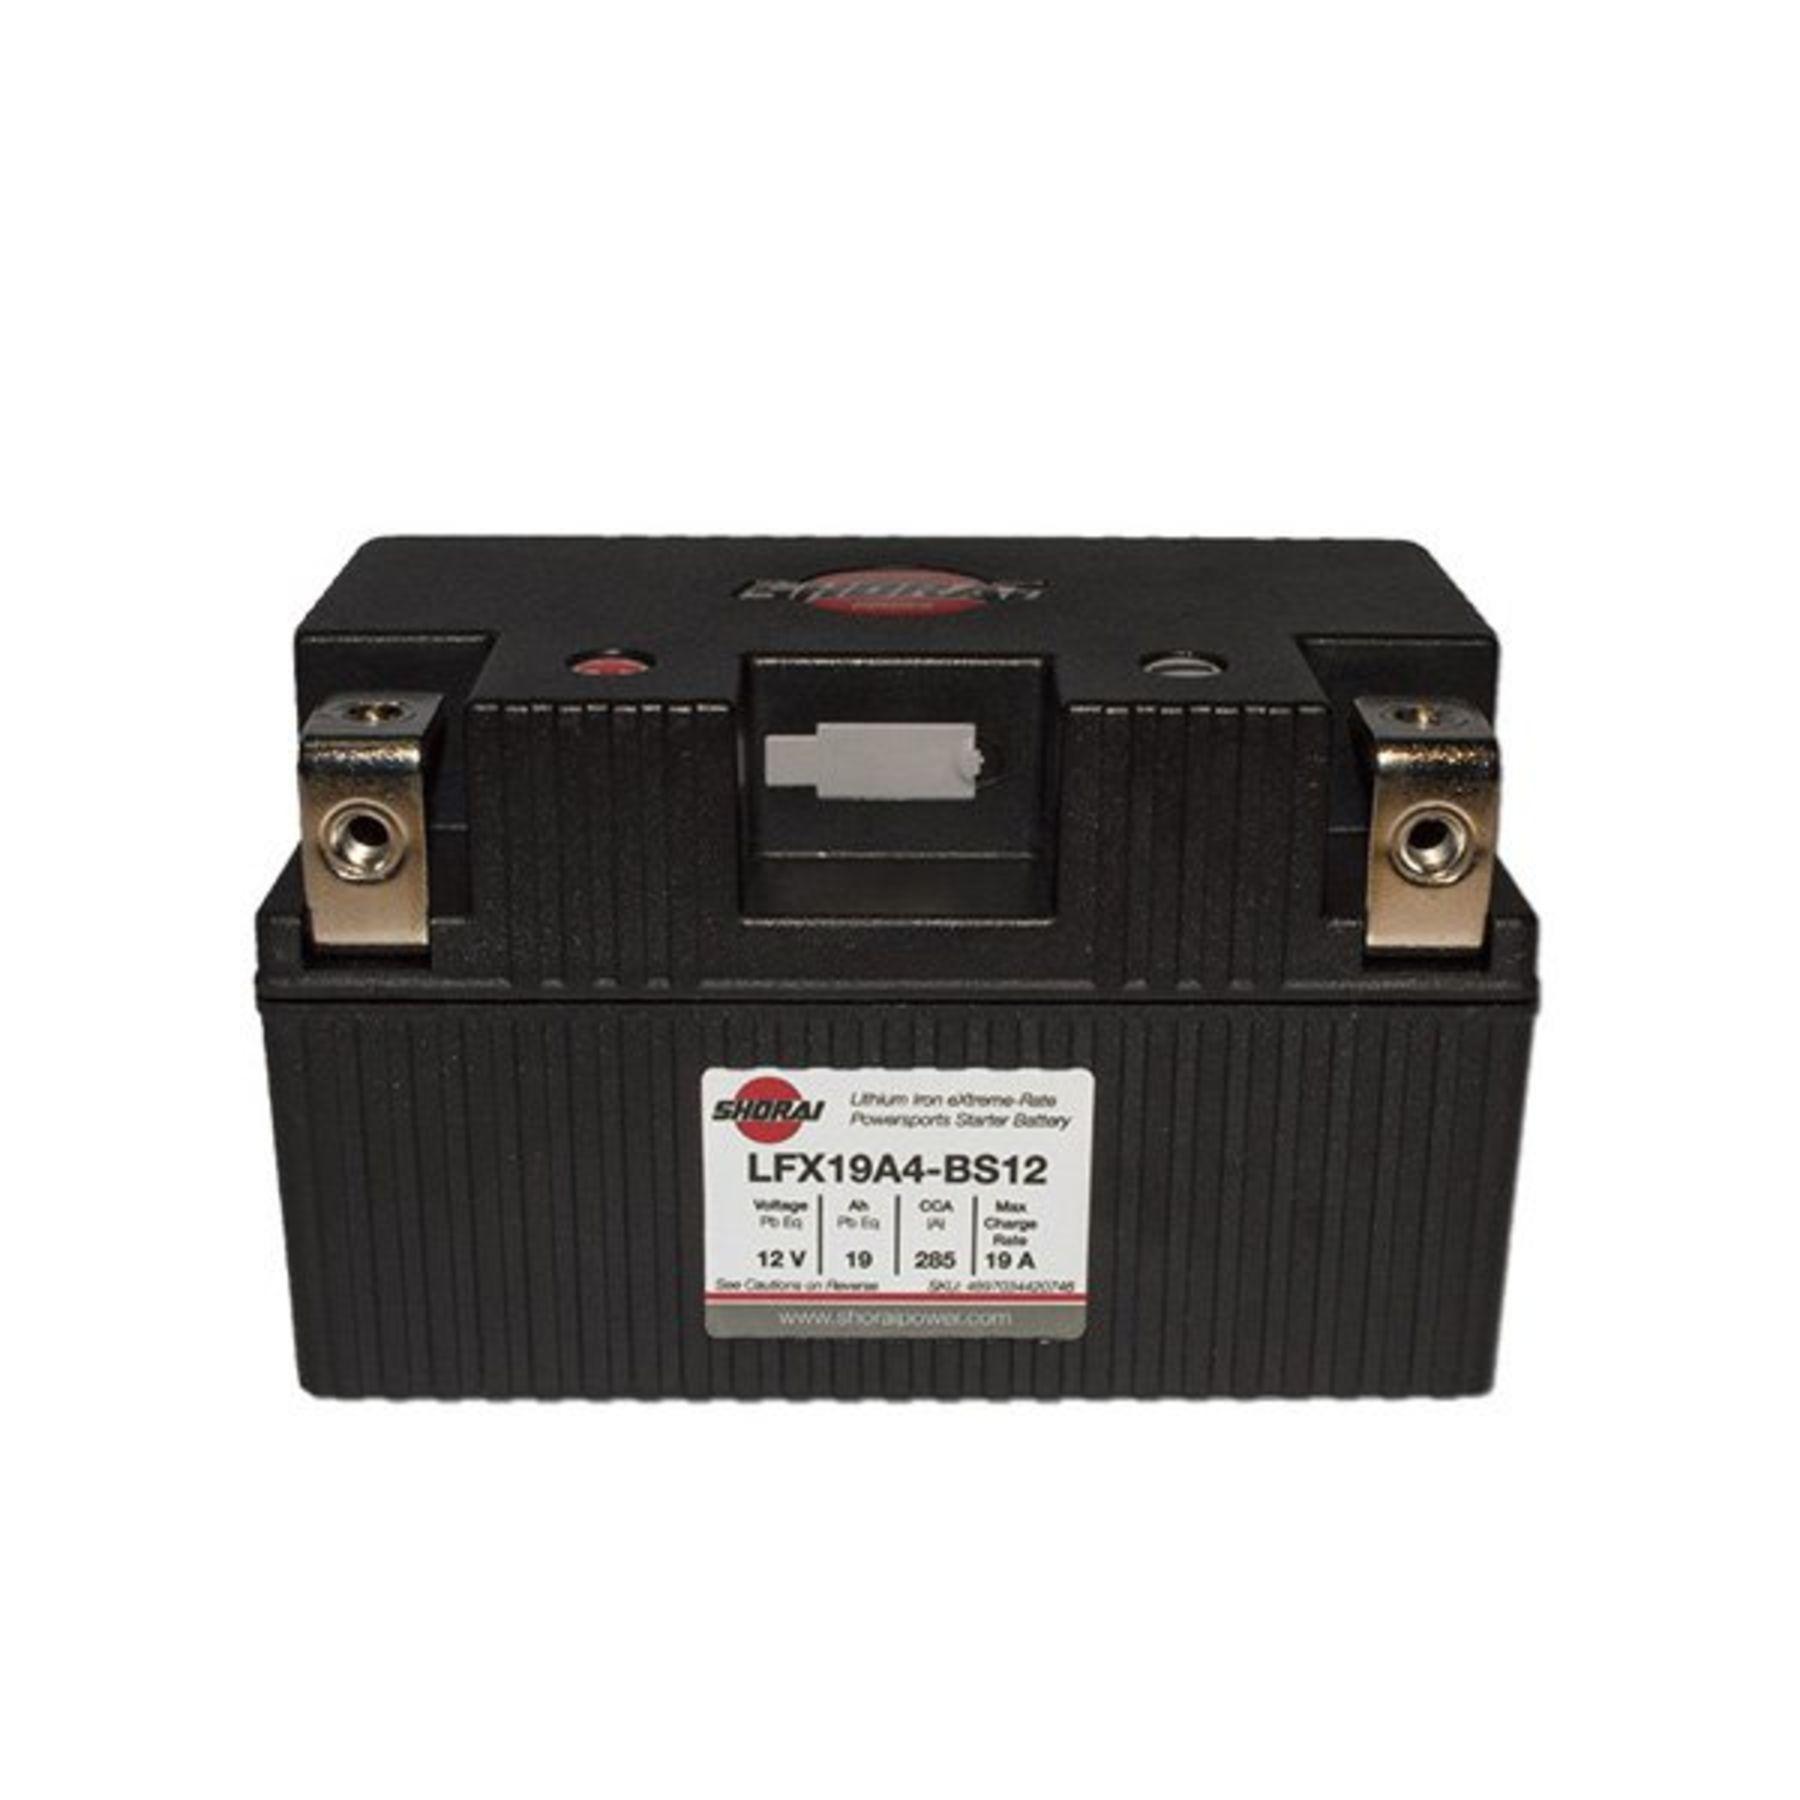 Lfx19a4 Bs12 Shorai 12v 19 Ah Pbeq Lifepo4 Battery 2011 Honda Vt1300cs Wiring Diagram